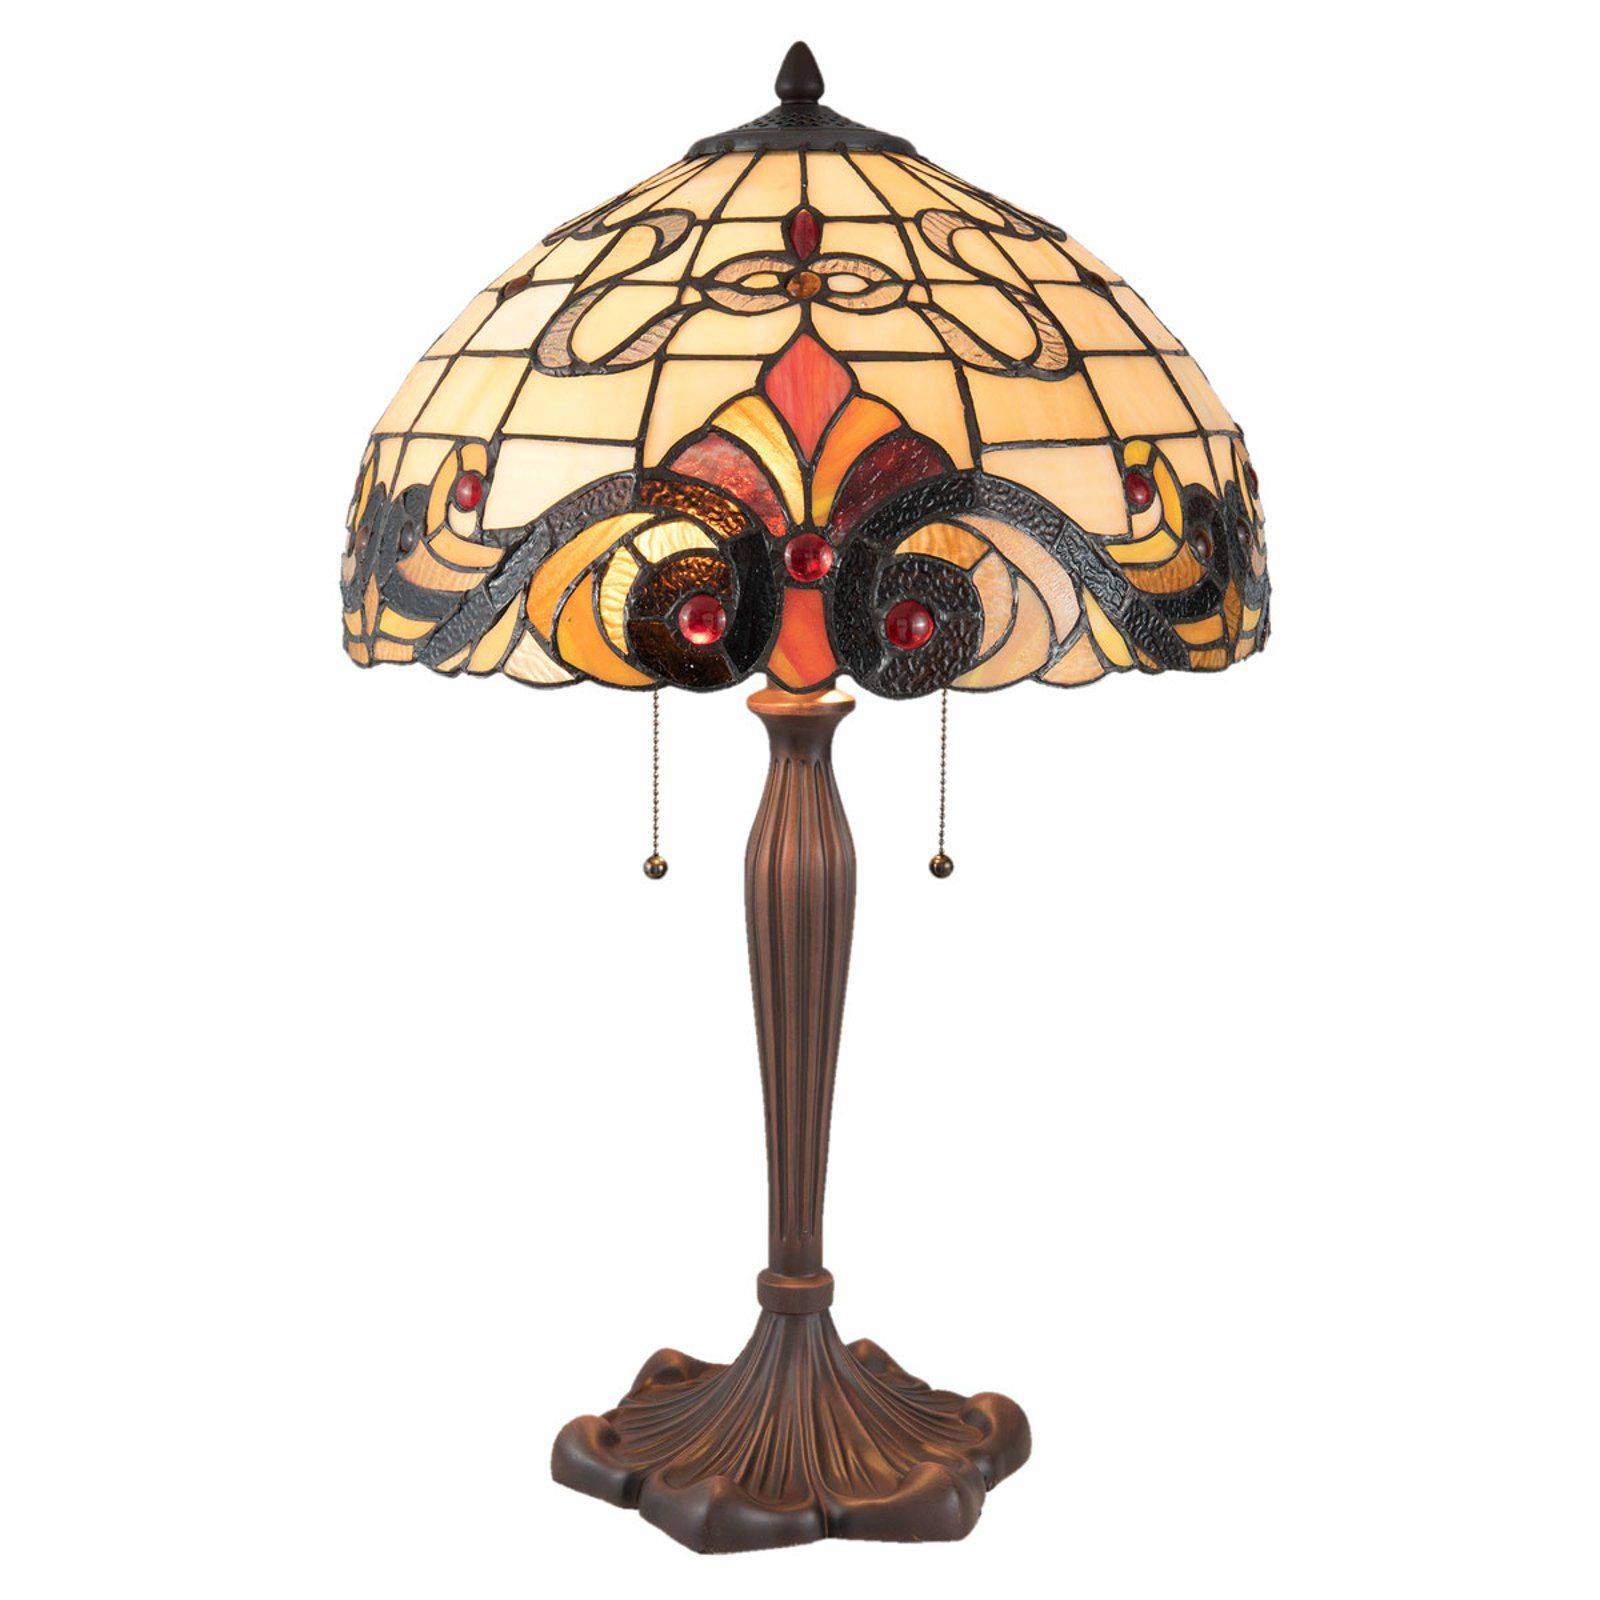 5925 bordlampe i Tiffany-stil, krem-rød